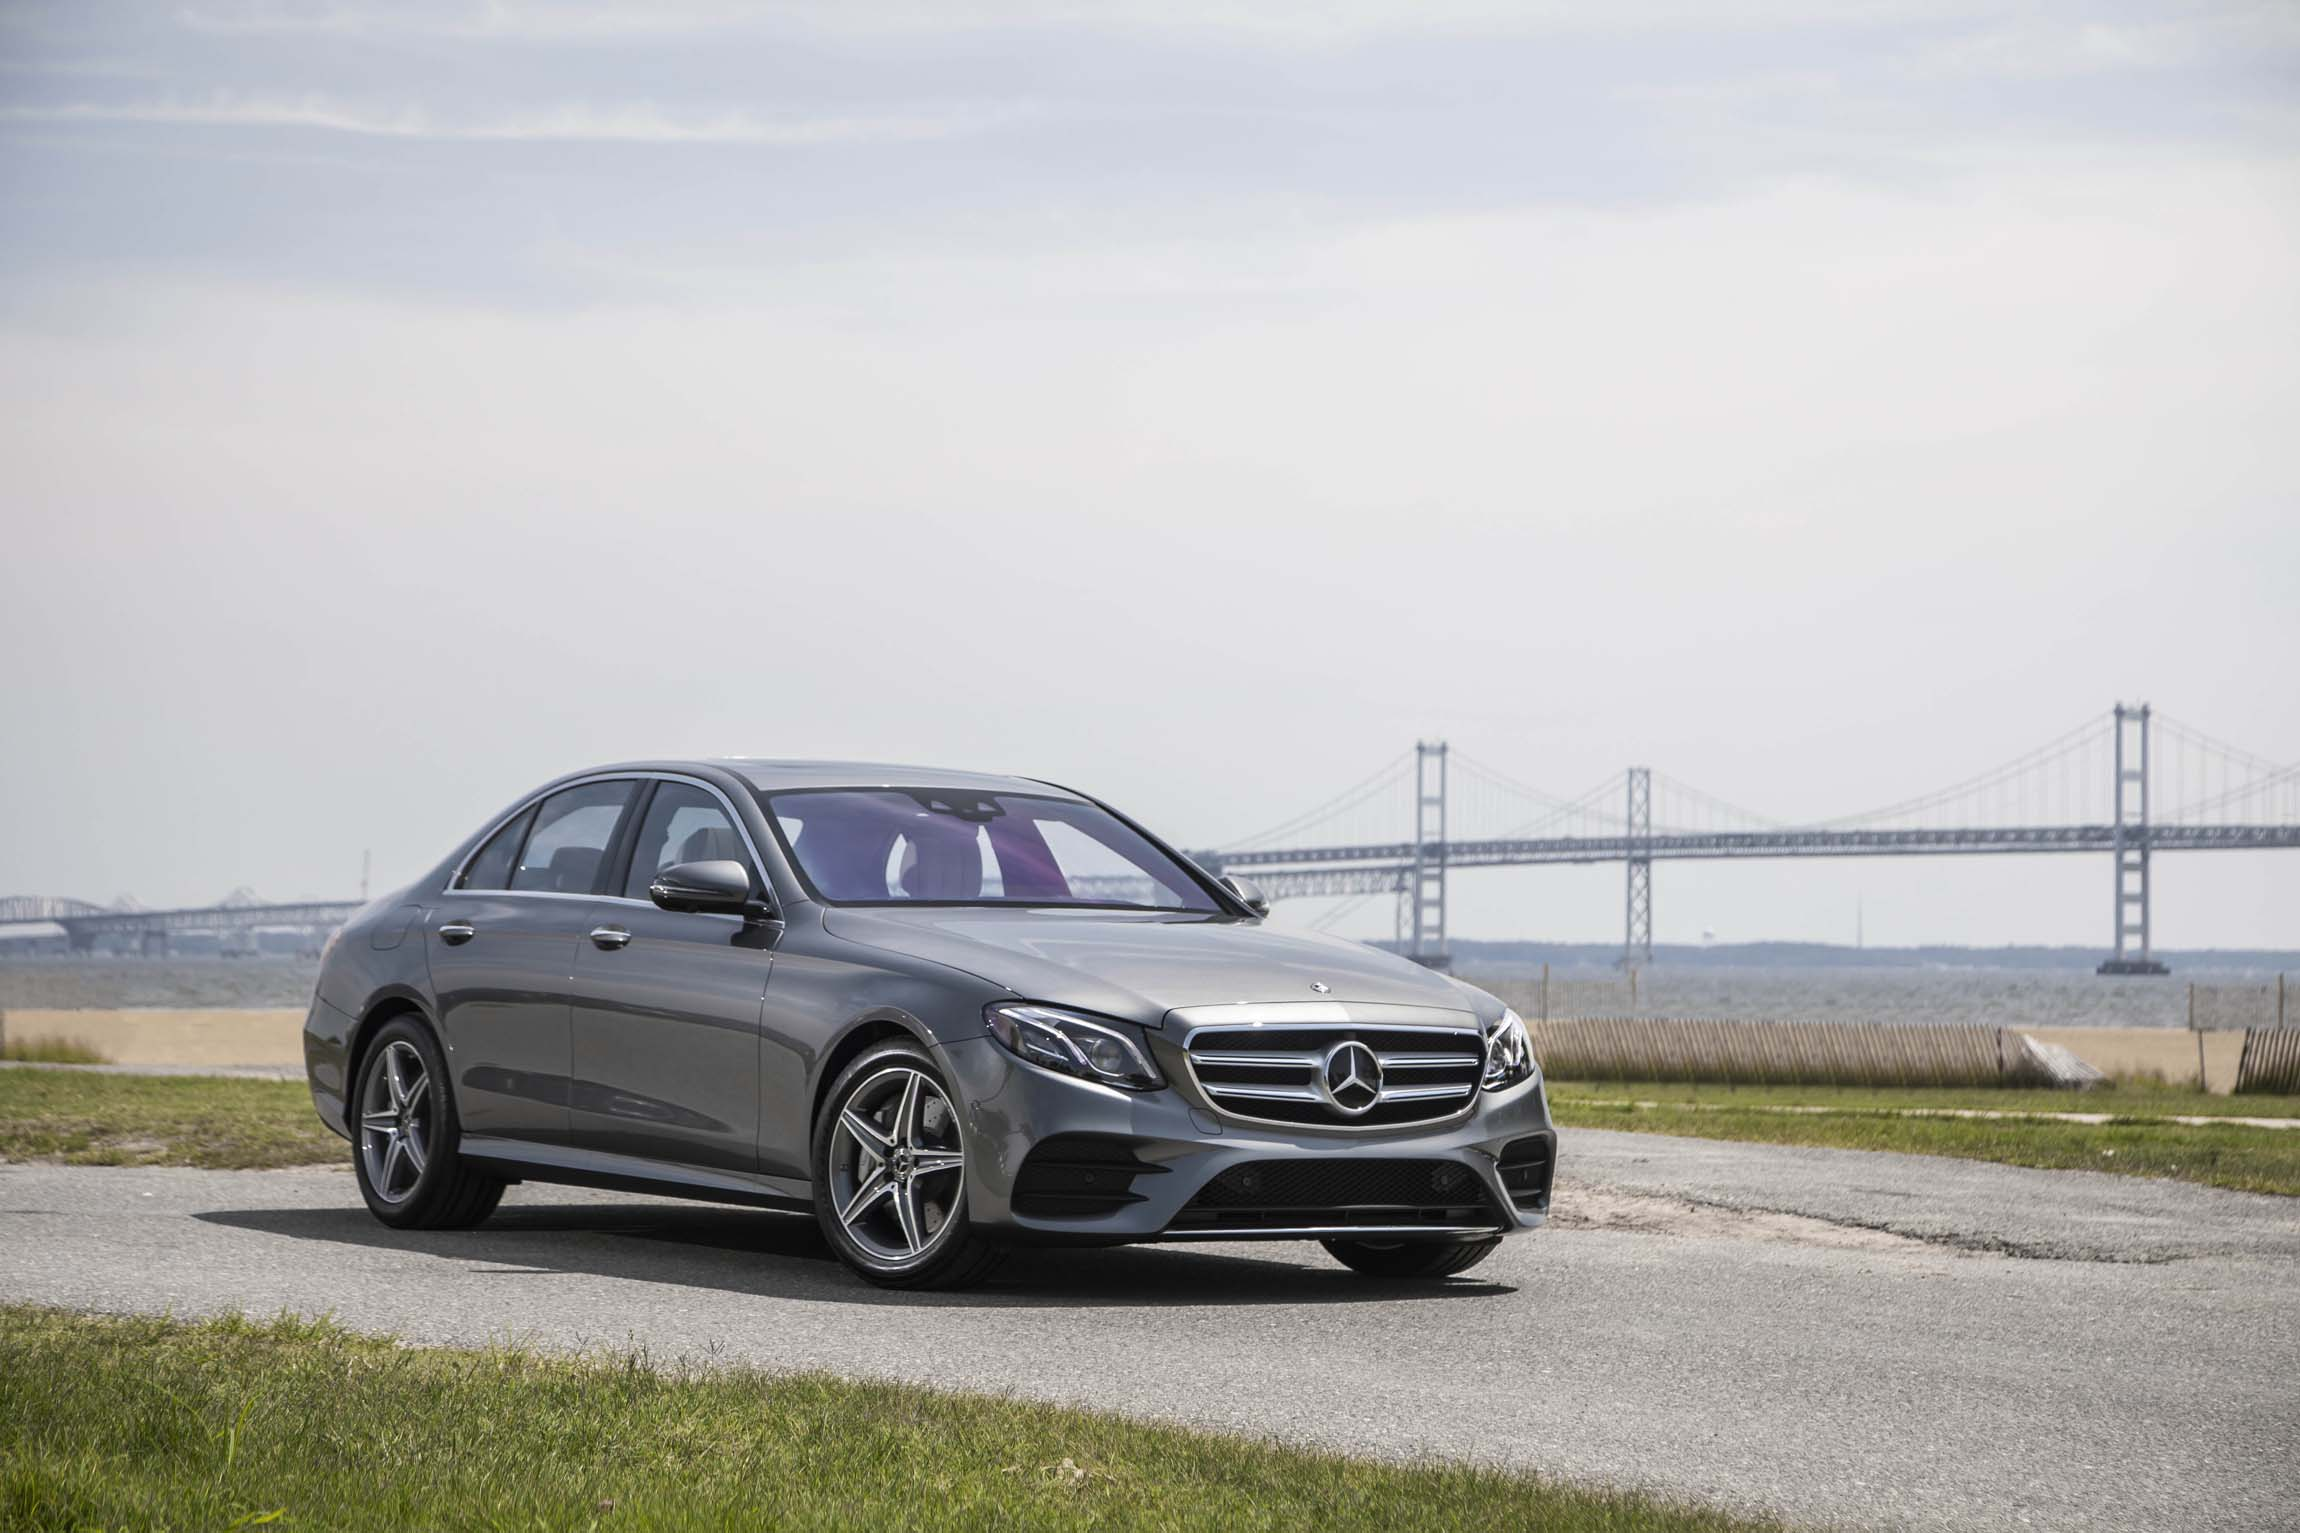 2020 Mercedes Benz E Class Spy Shoot